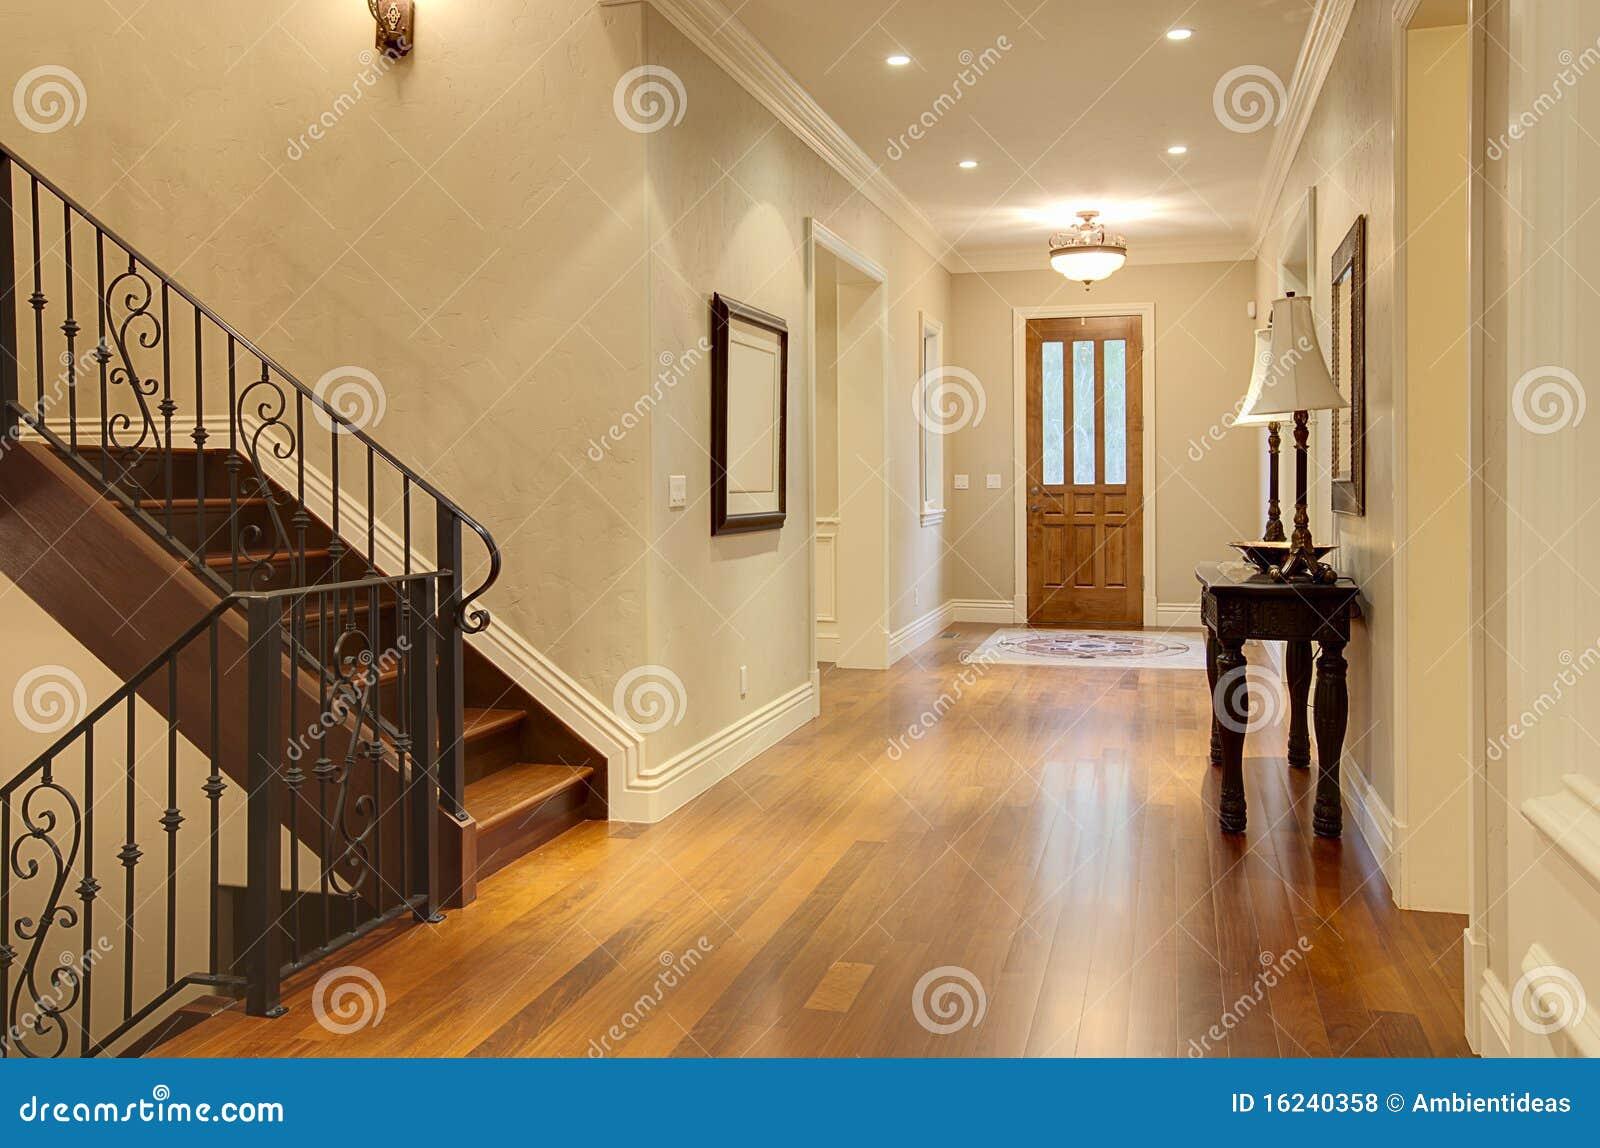 Luxury Home Hallway Entrance Stock Photo Image 16240358